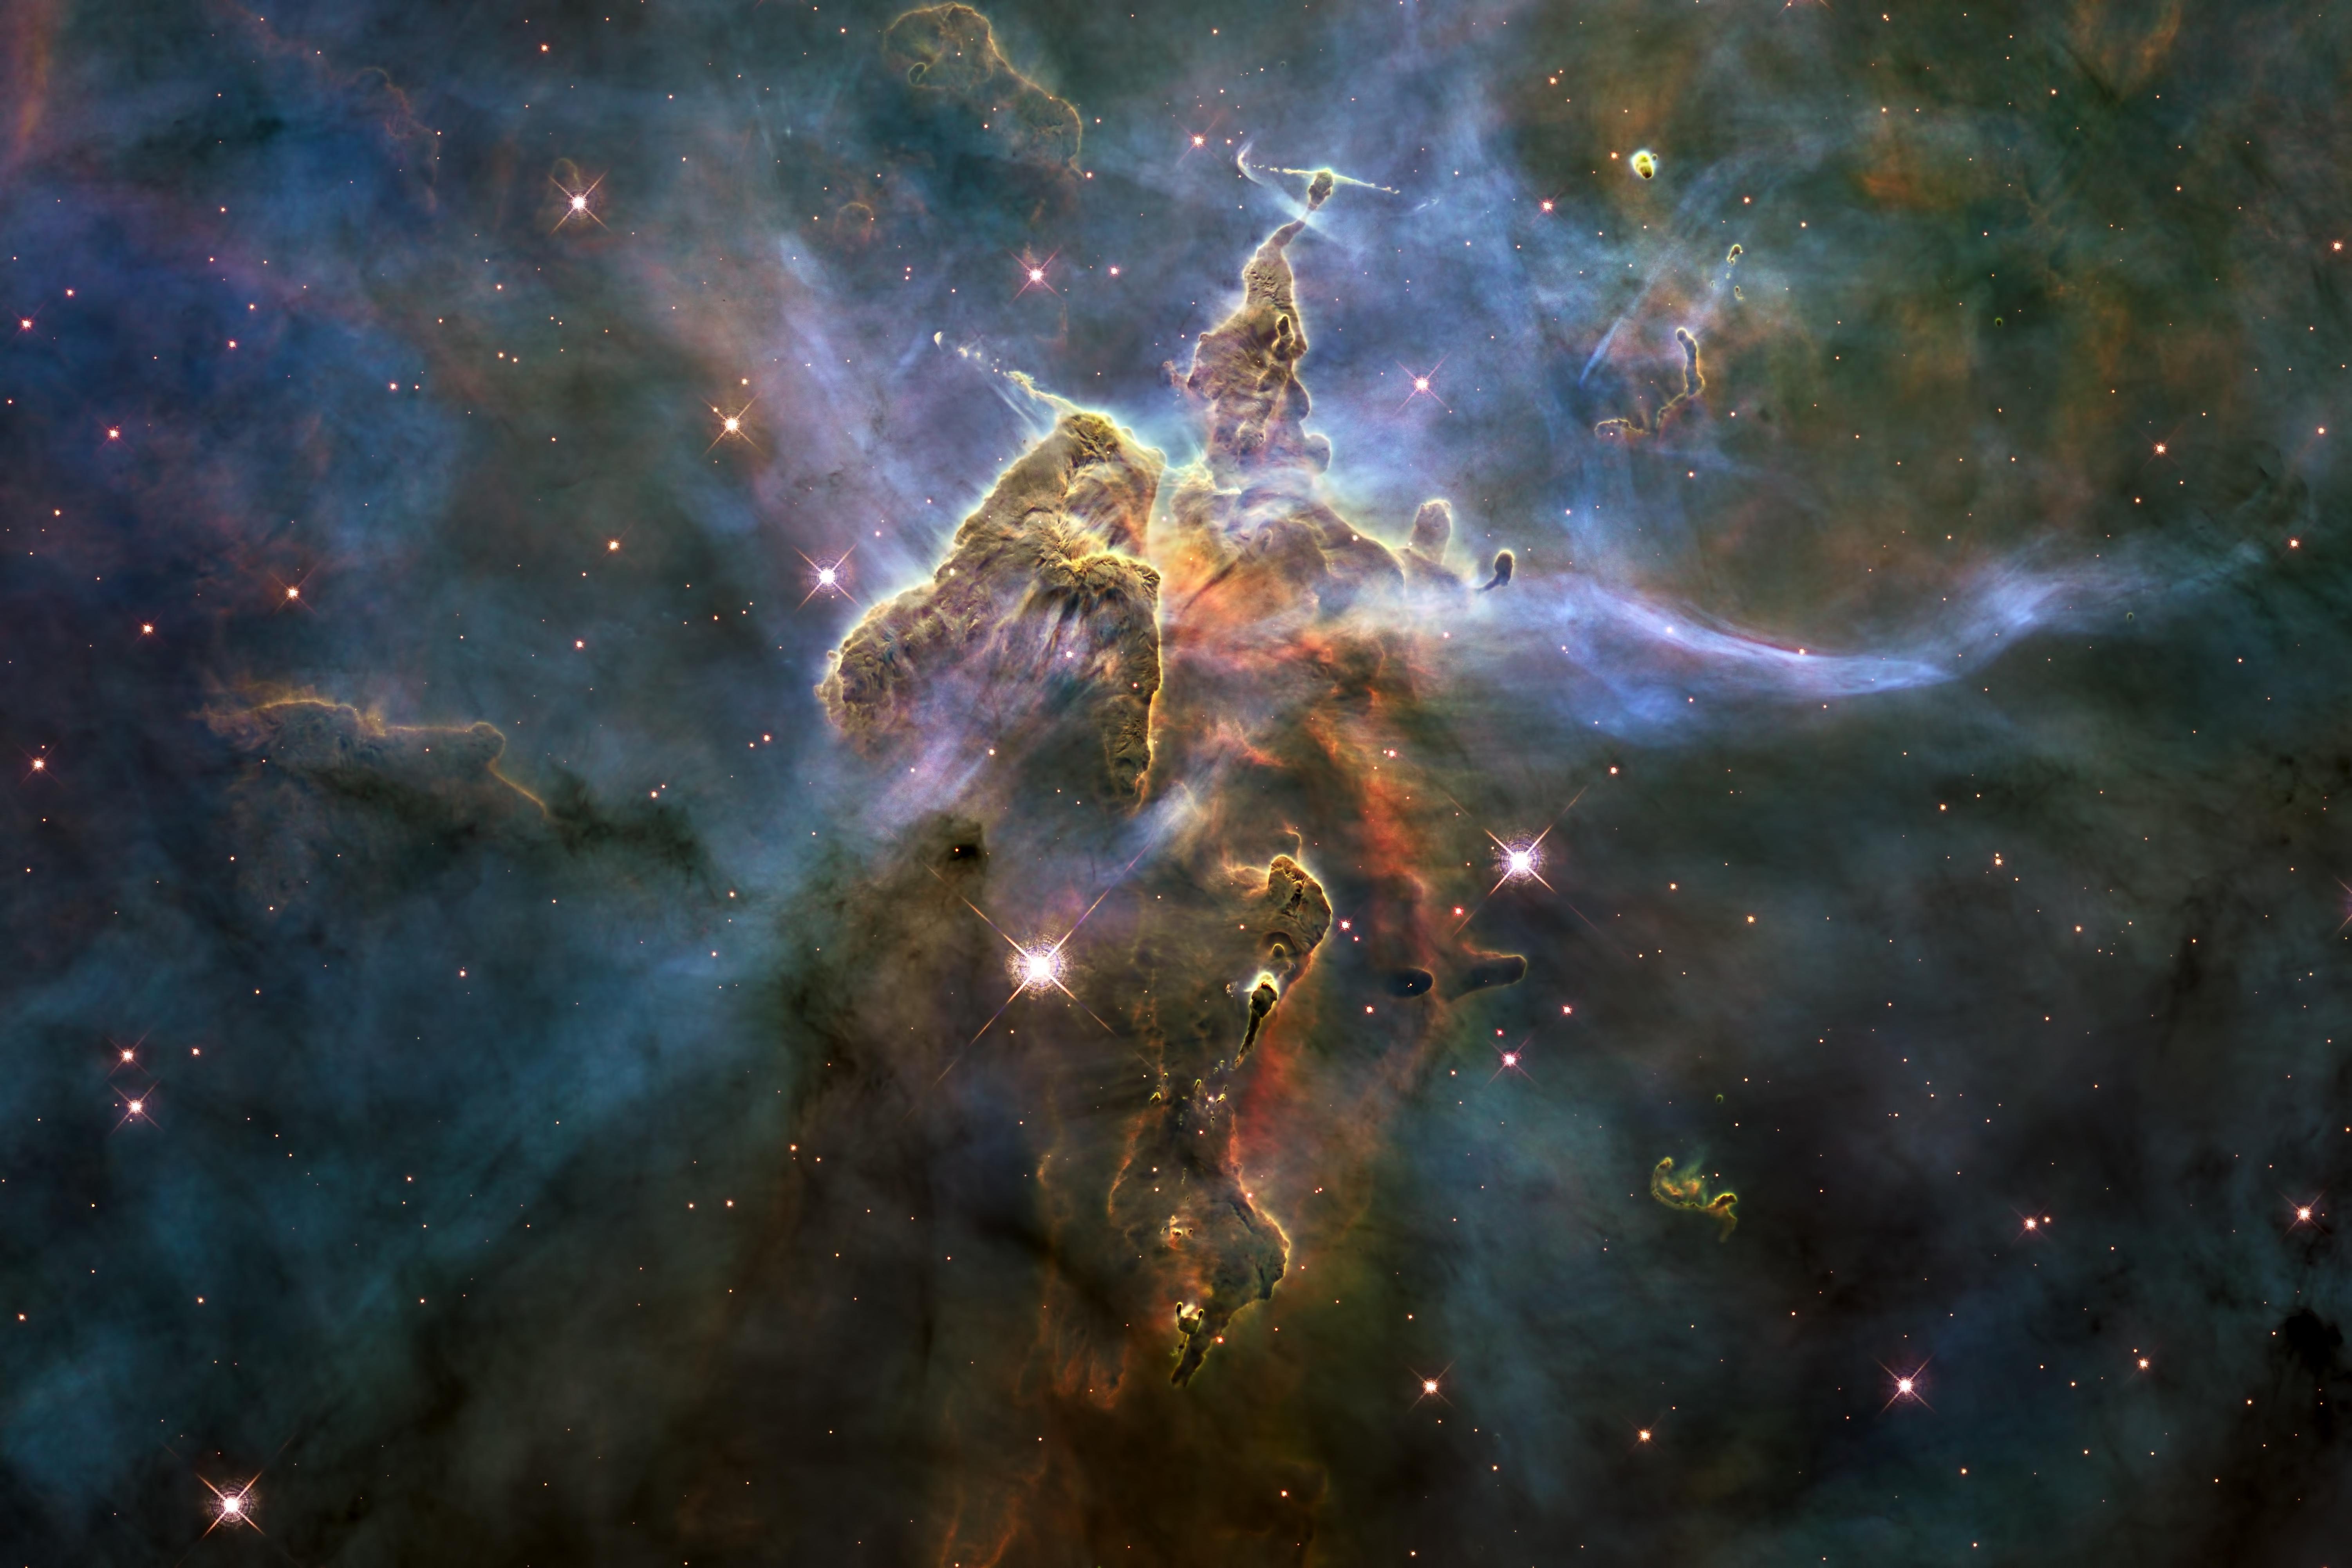 nebula weed wallpaper - photo #20